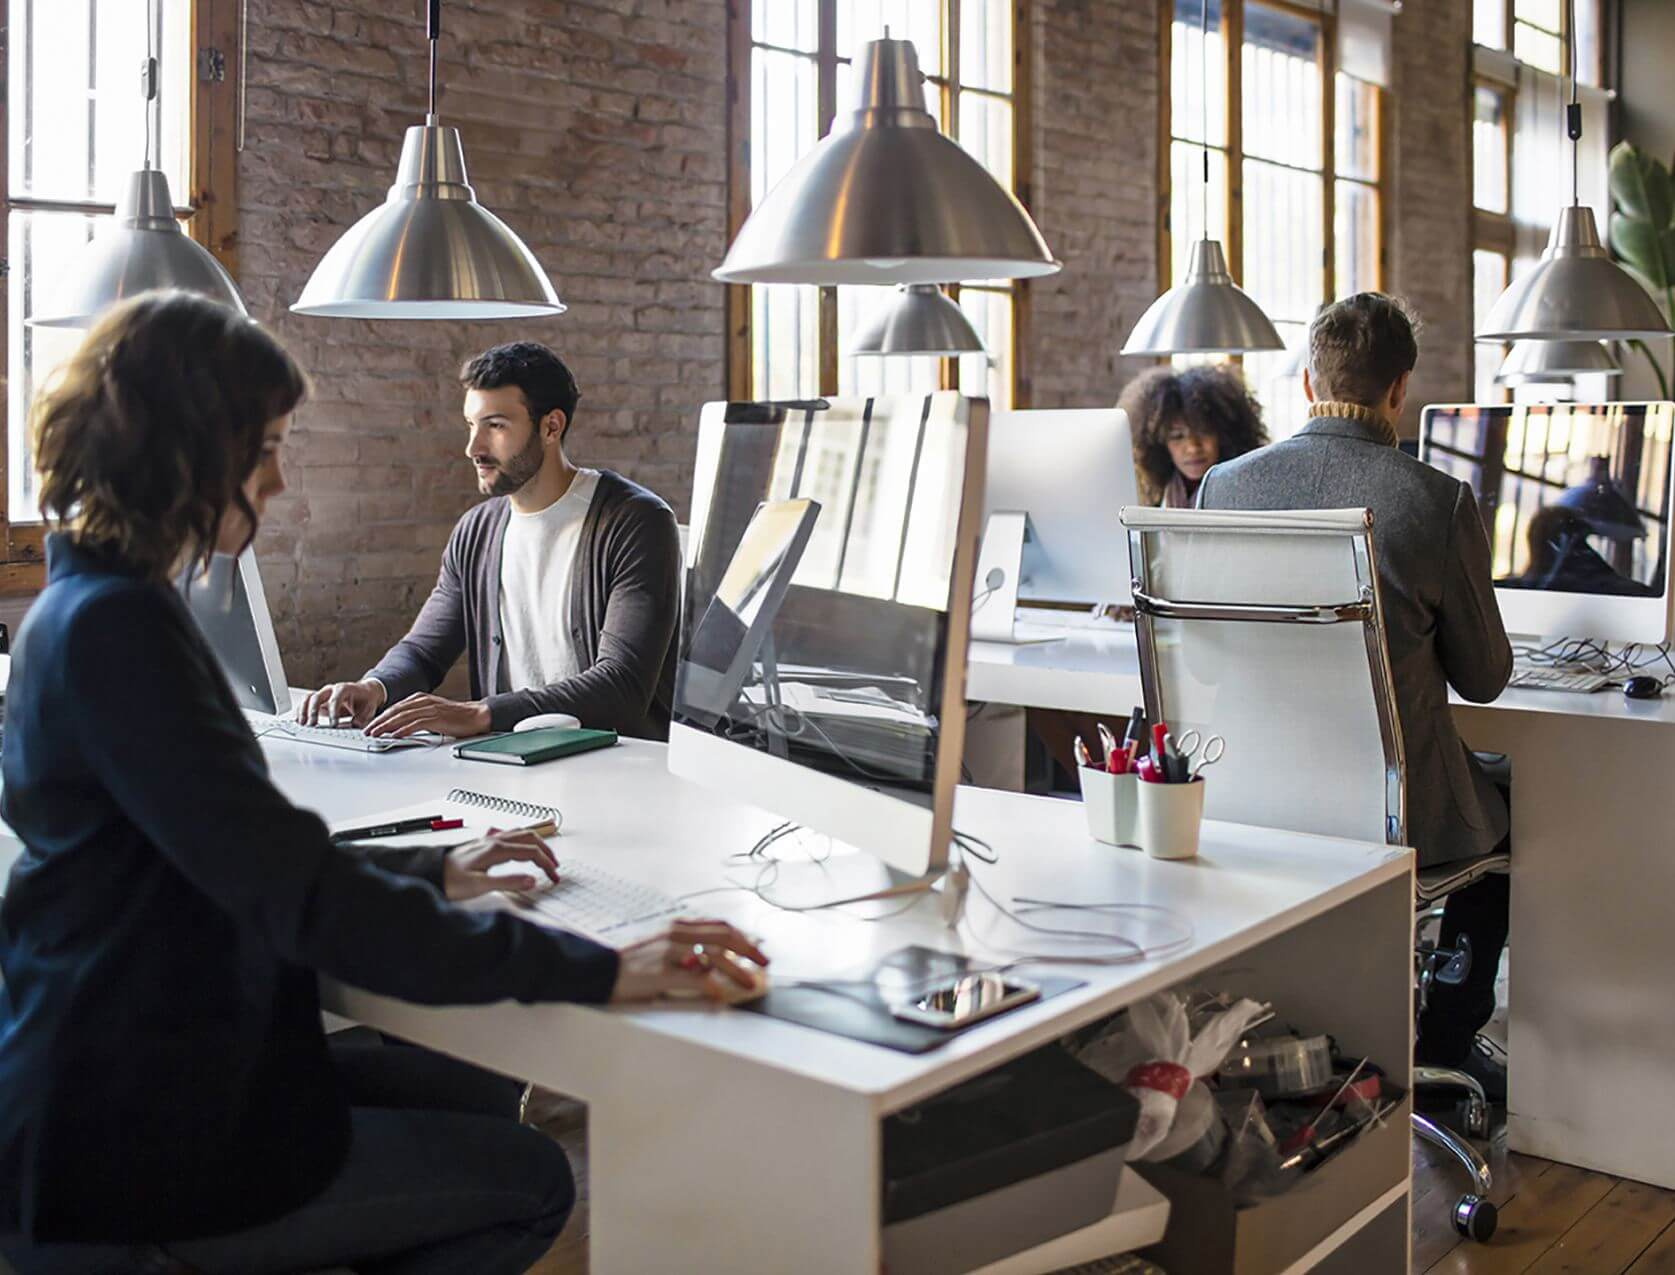 Protecting Interior Design Business